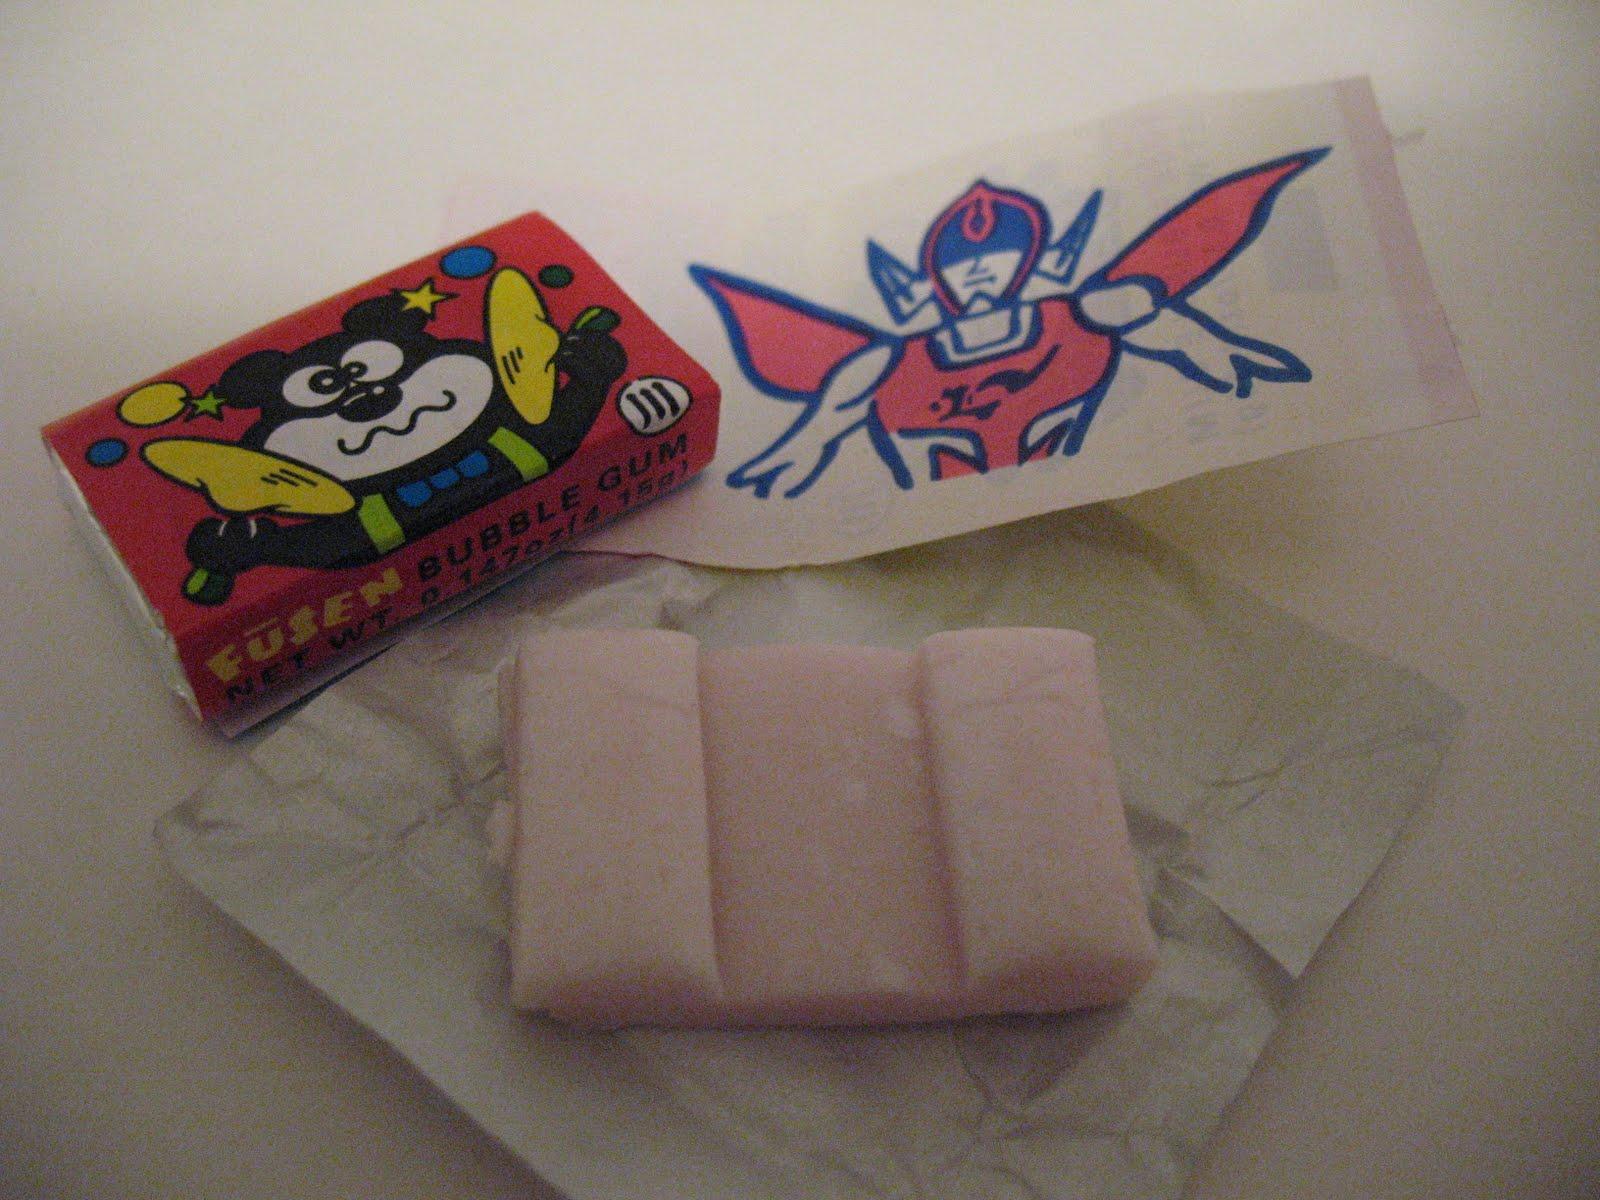 http://www.sugabush.com/wp-content/uploads/2014/05/Candy-Fusen-Gum.jpg